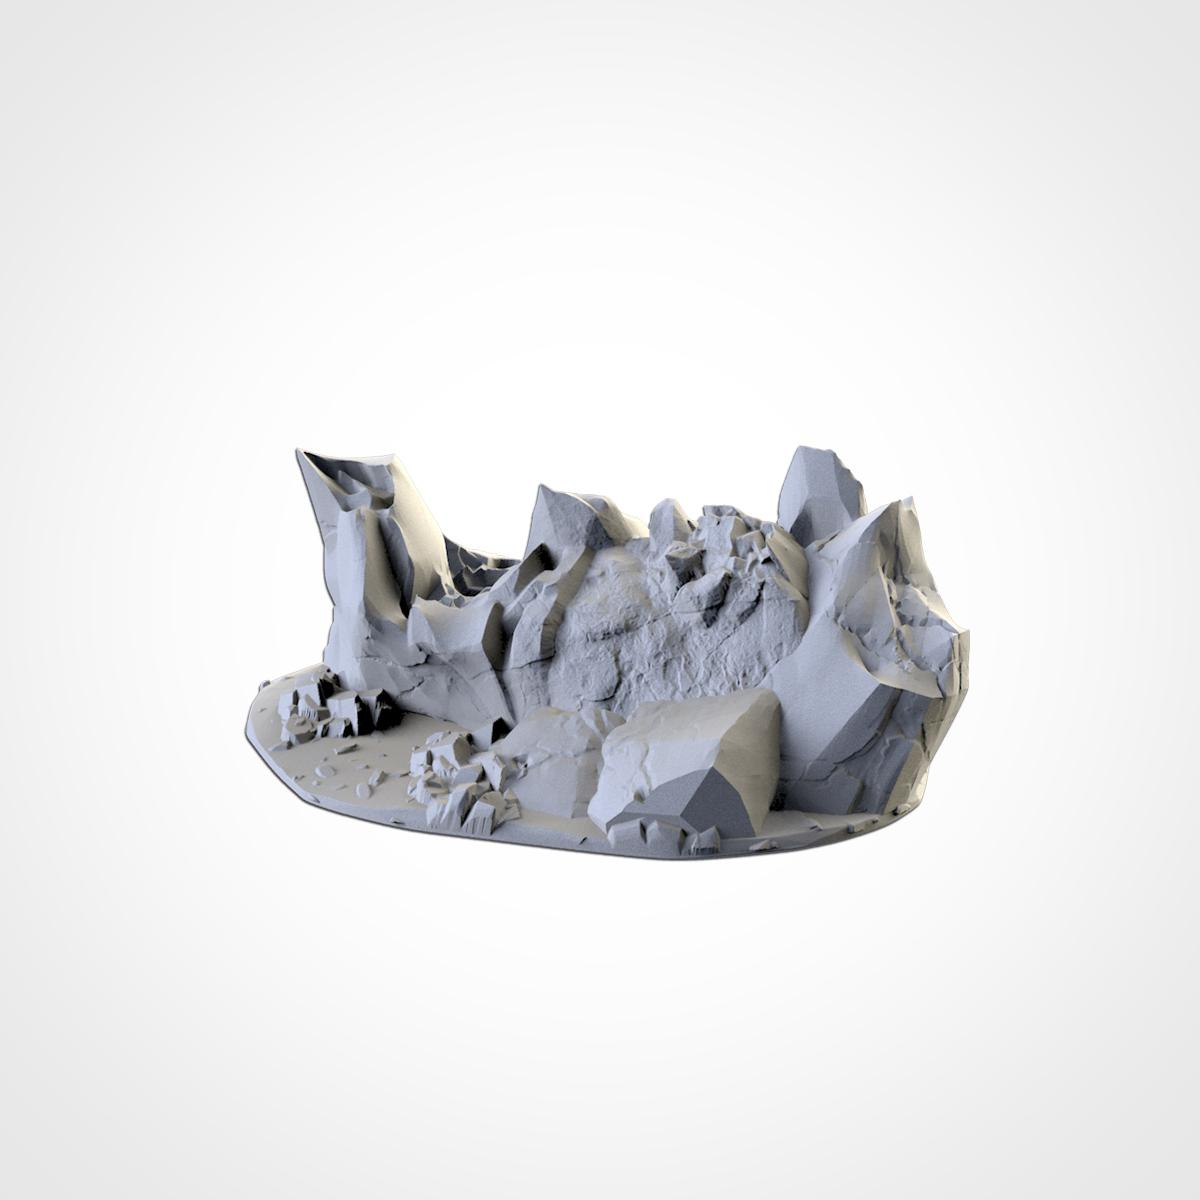 TXFA_WEB_ROCKY_05_01.jpg Download STL file ROCKY TERRAIN • 3D printing object, Txarli_Factory